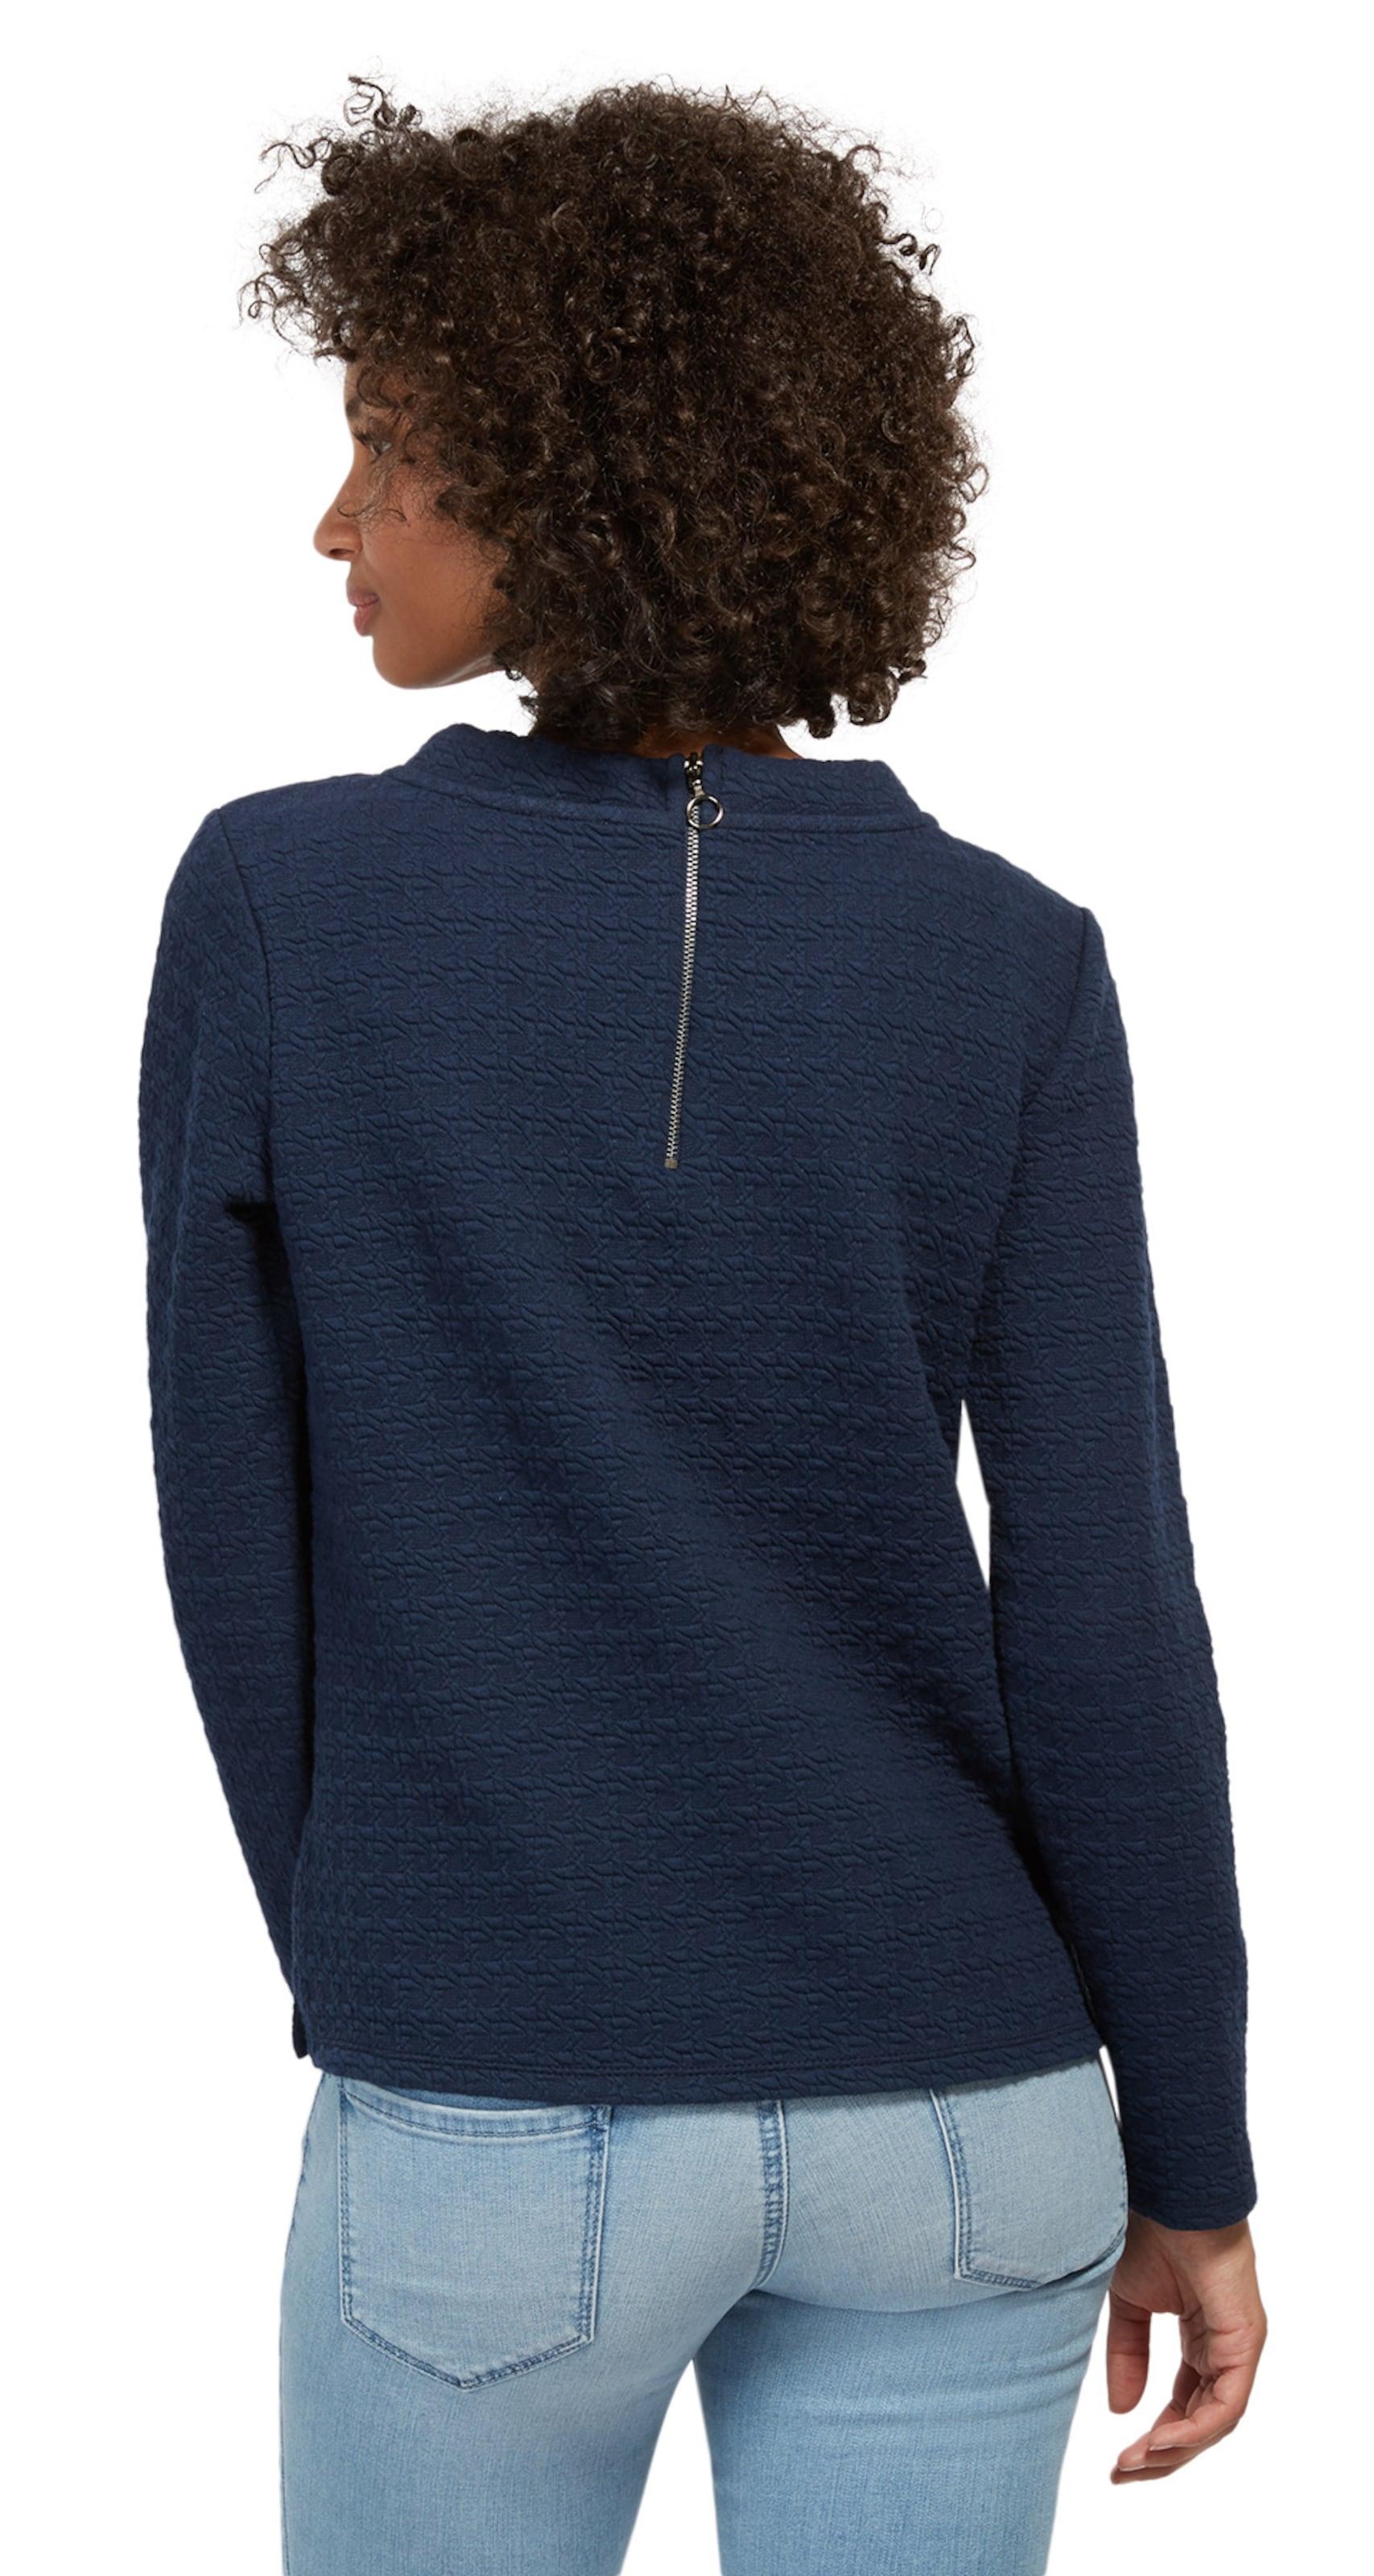 TOM TAILOR Strukturiertes Sweatshirt Fälschung ba5sUKbd